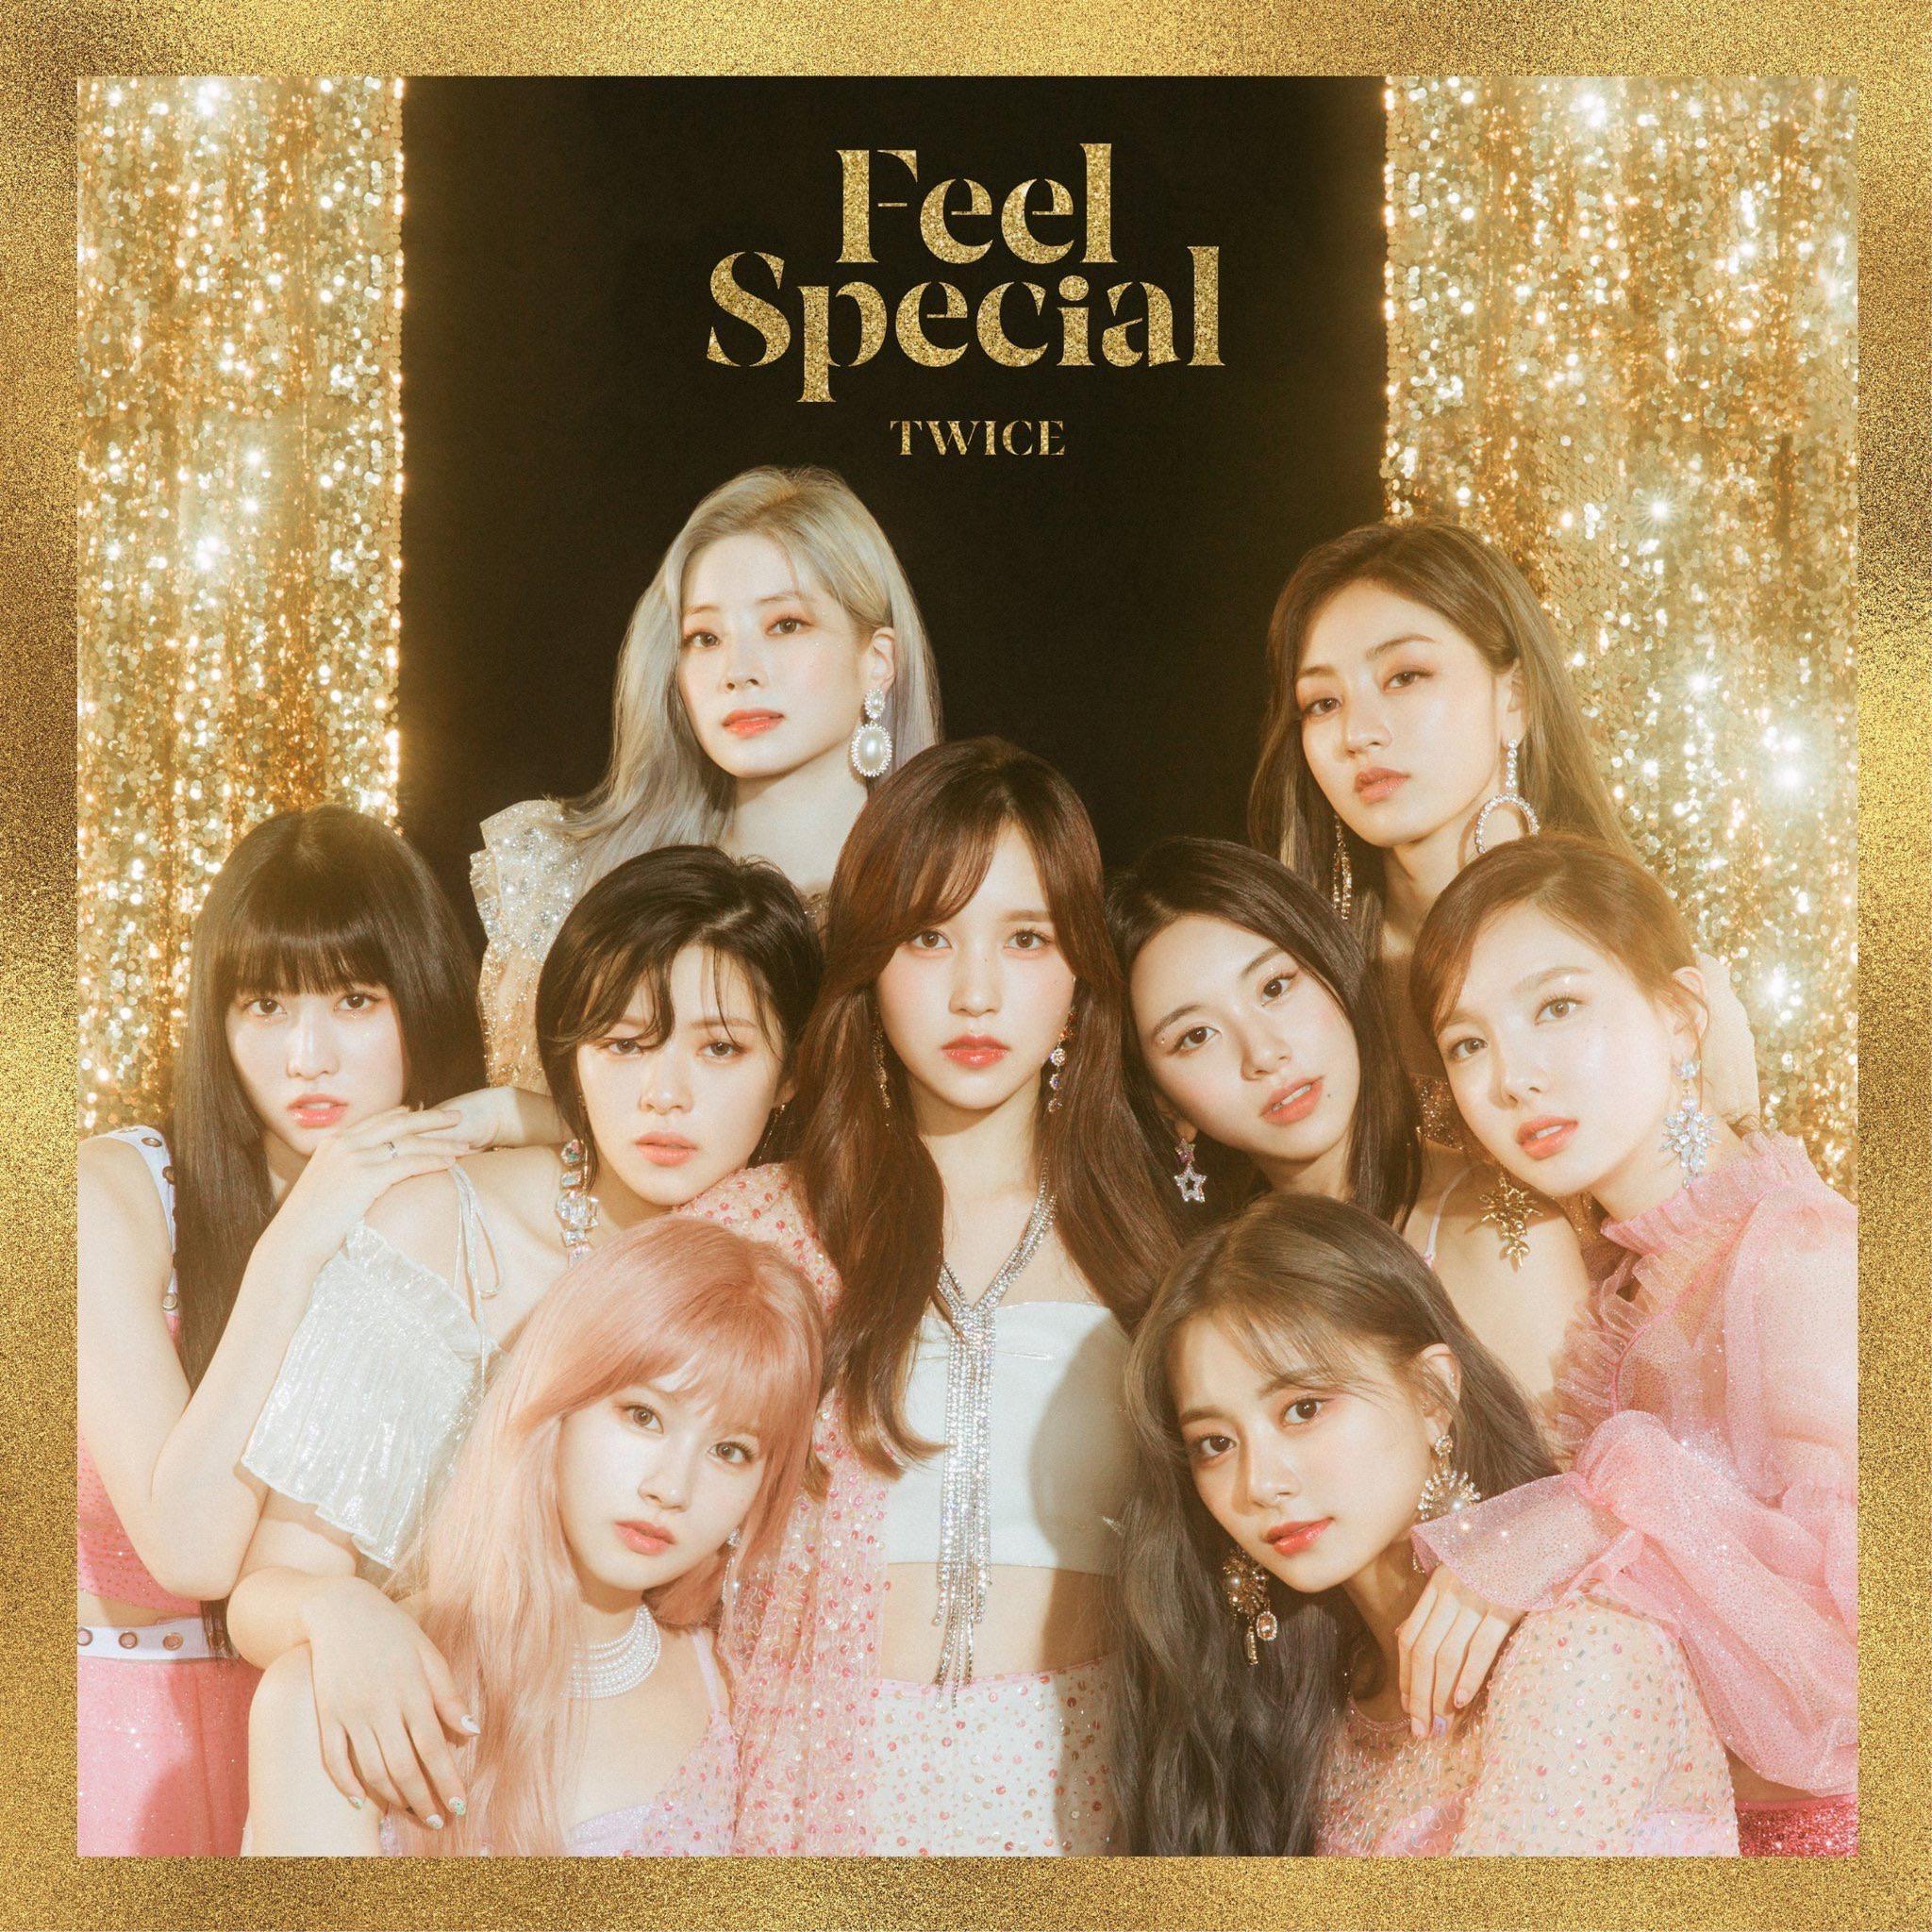 TWICE – Feel Special [24bit Lossless + MP3 320 / WEB] [2019.09.23]